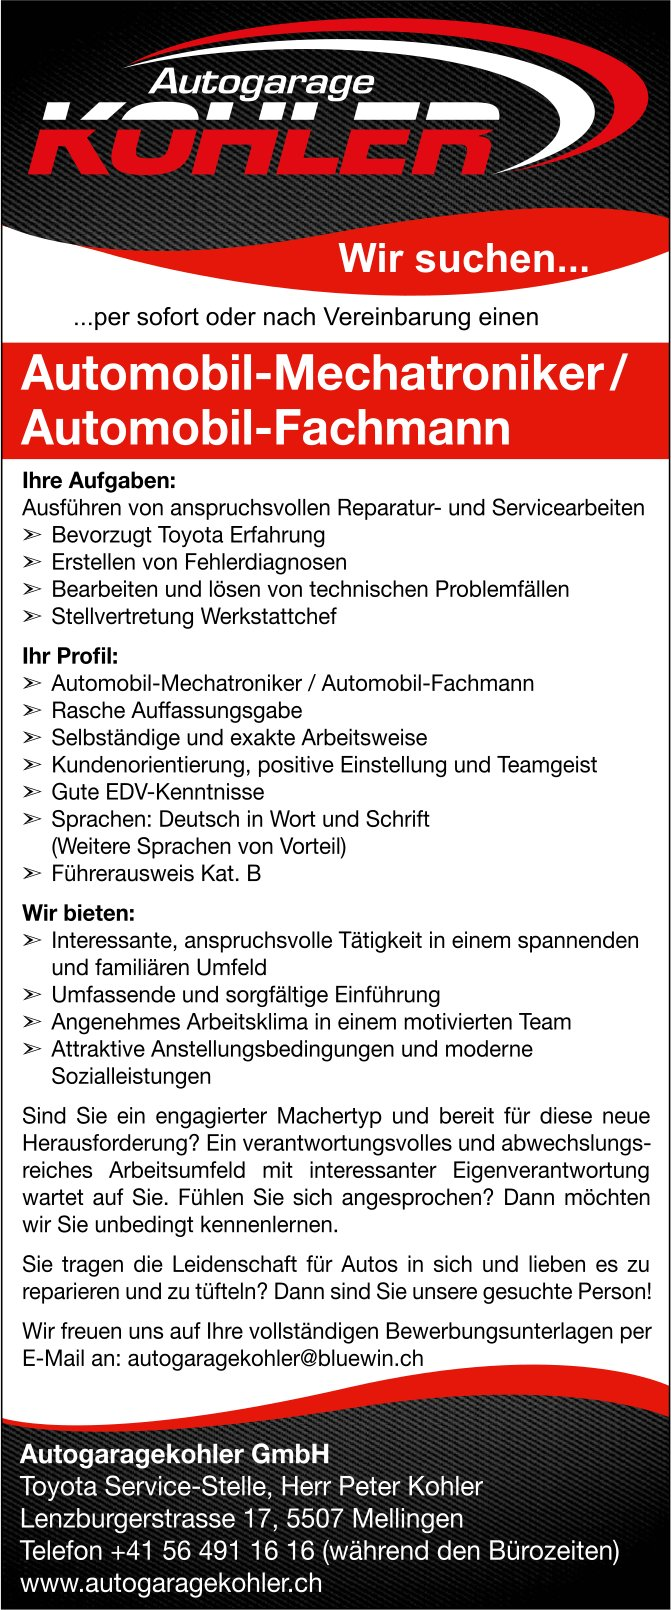 Automobil-Mechatroniker / Automobil-Fachmann bei Autogaragekohler GmbH gesucht